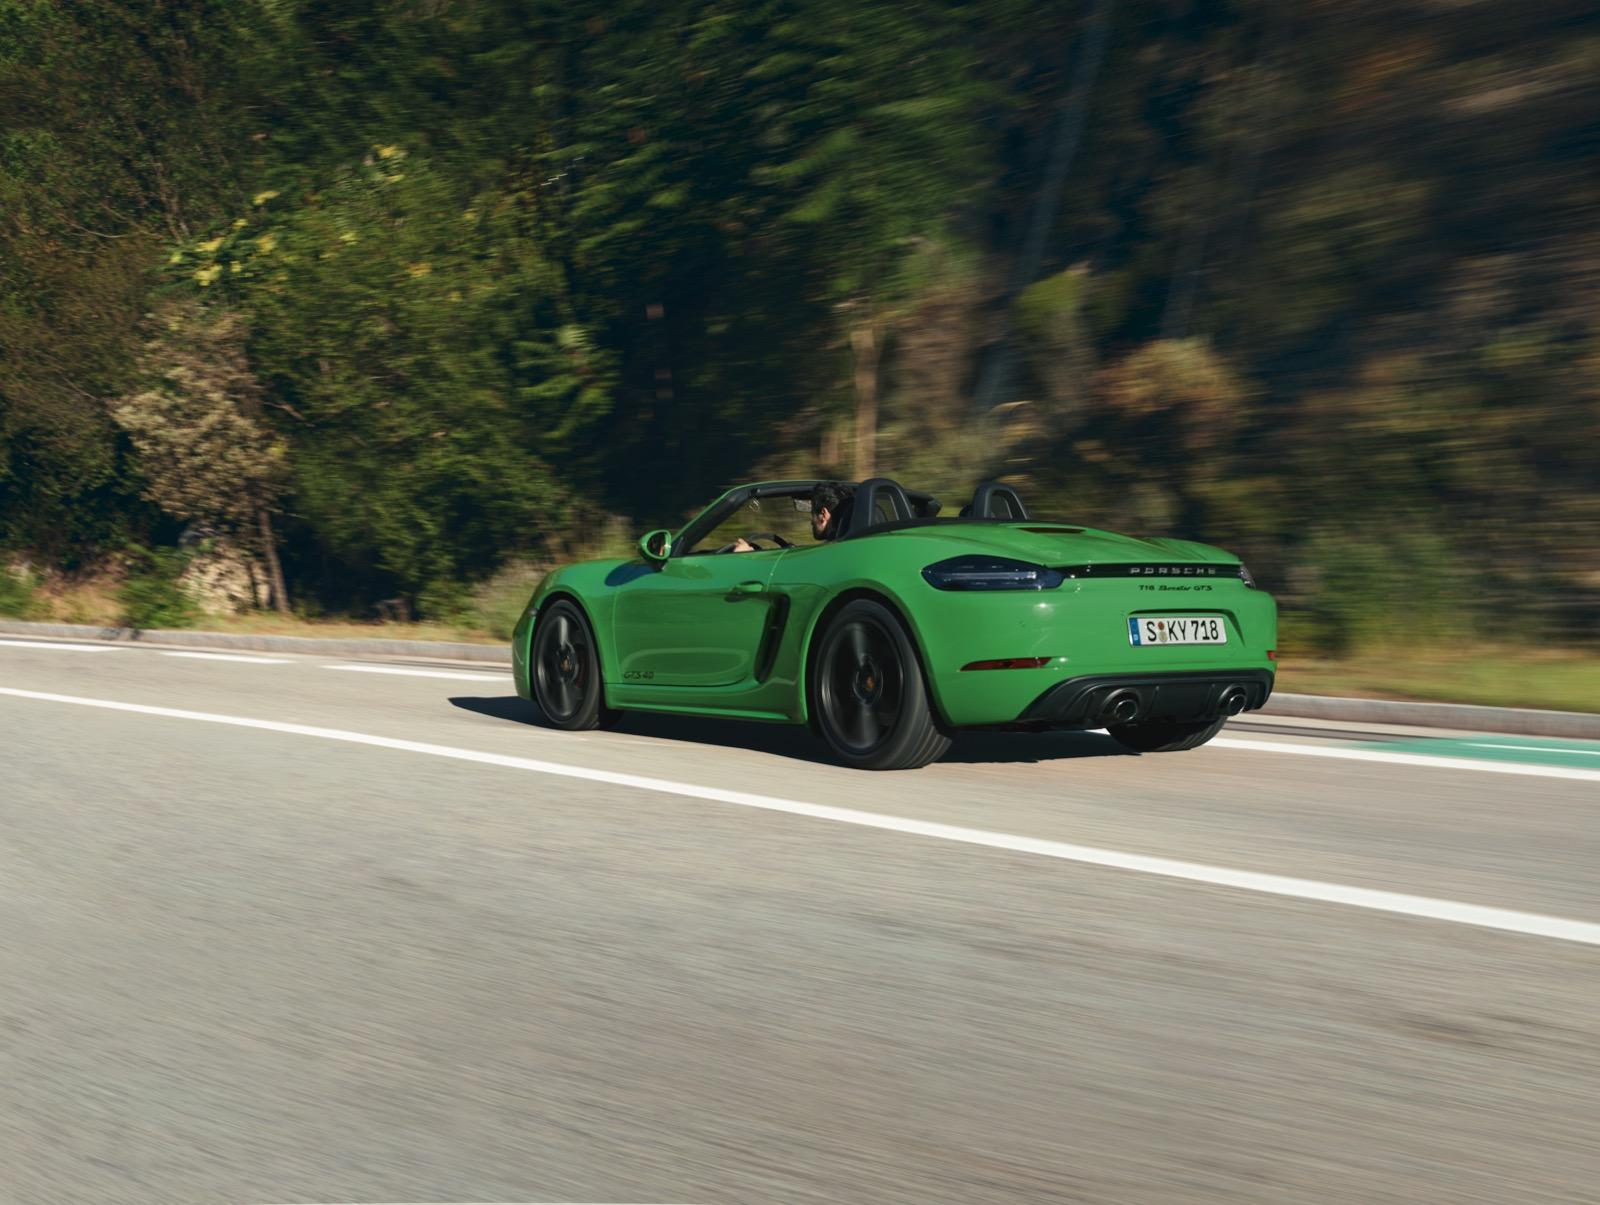 Porsche 718 Gts 1